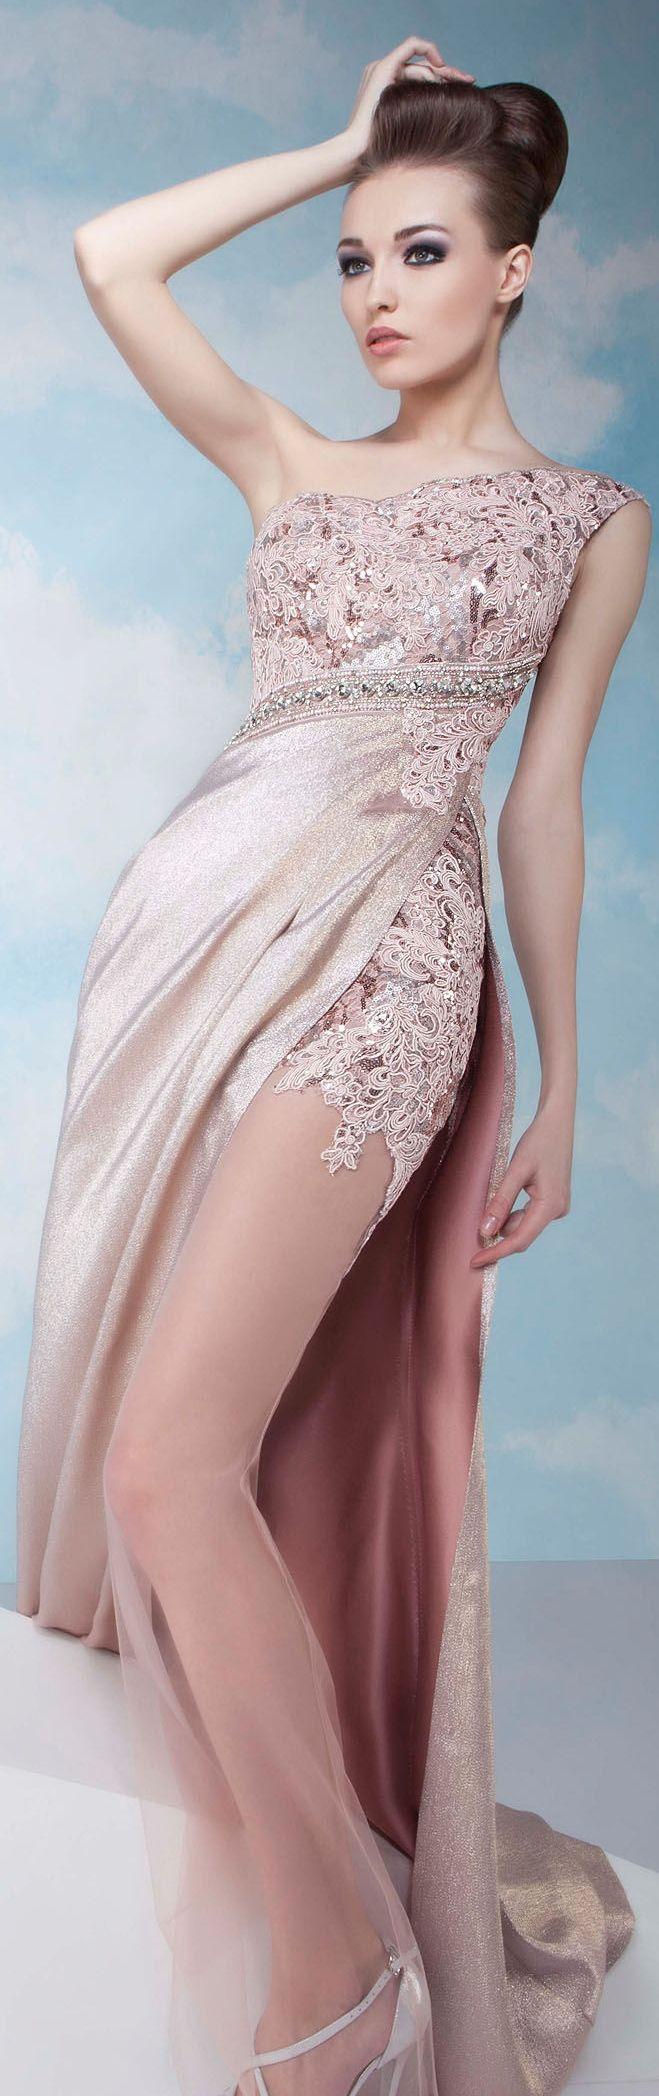 Tony Chaaya Couture S/S 2014